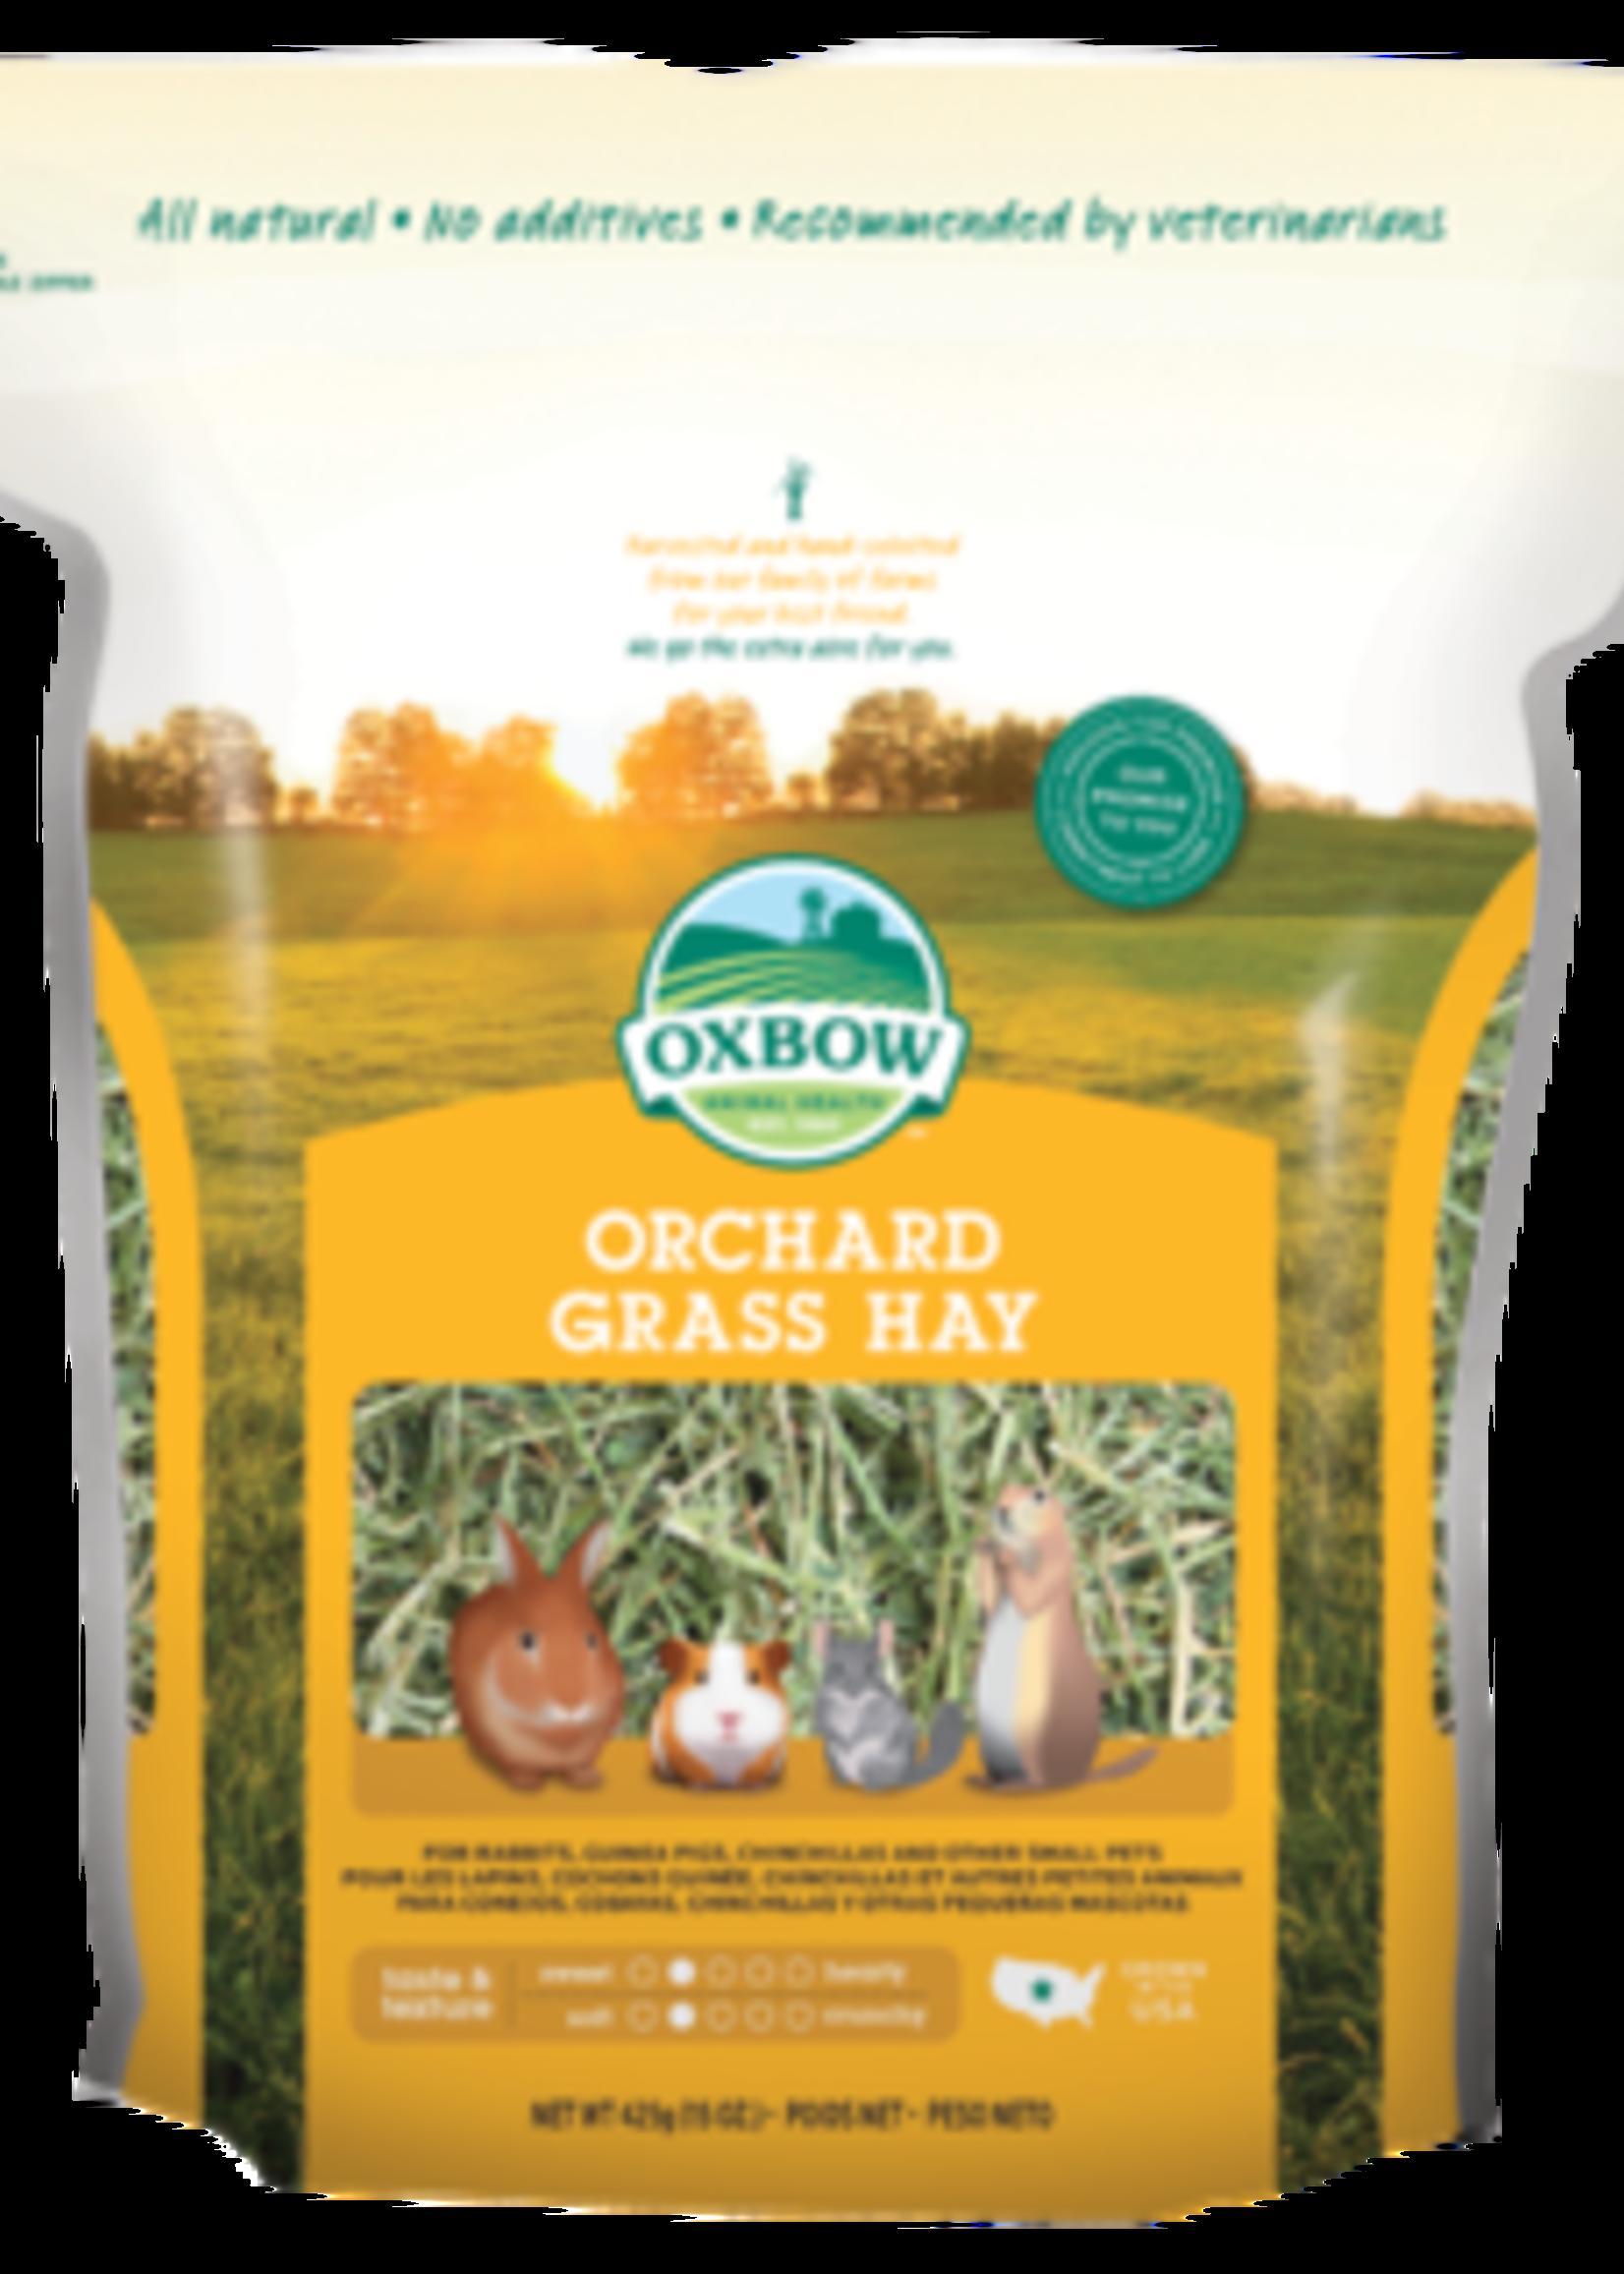 Oxbow Animal Health™ OXBOW ORCHARD GRASS HAY 40oz